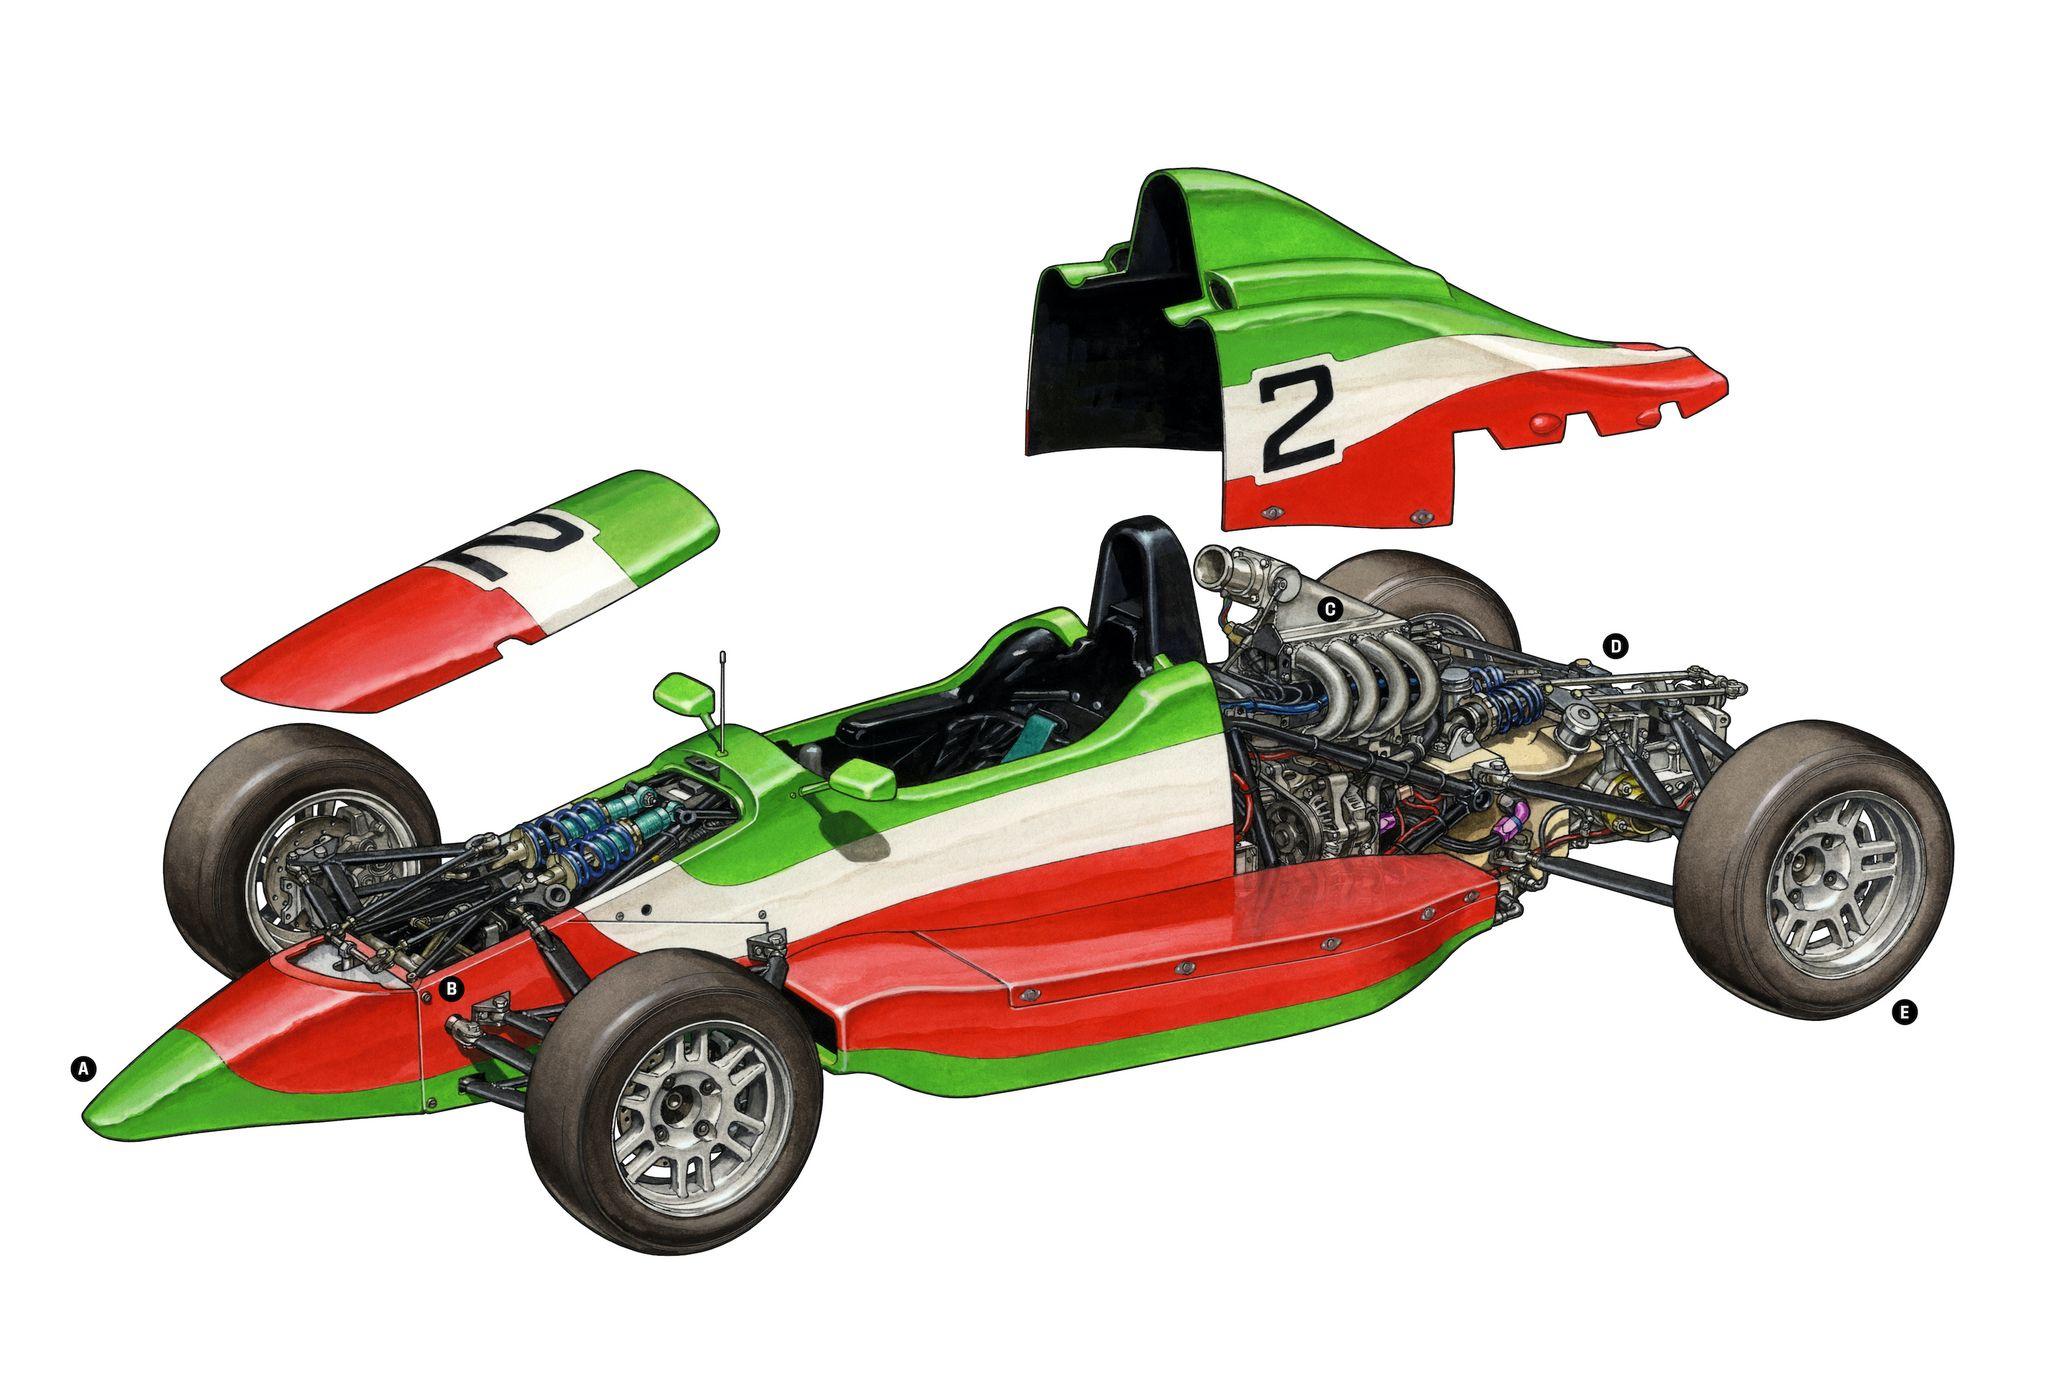 Meet F1600, The Link Between Karting and Superstardom